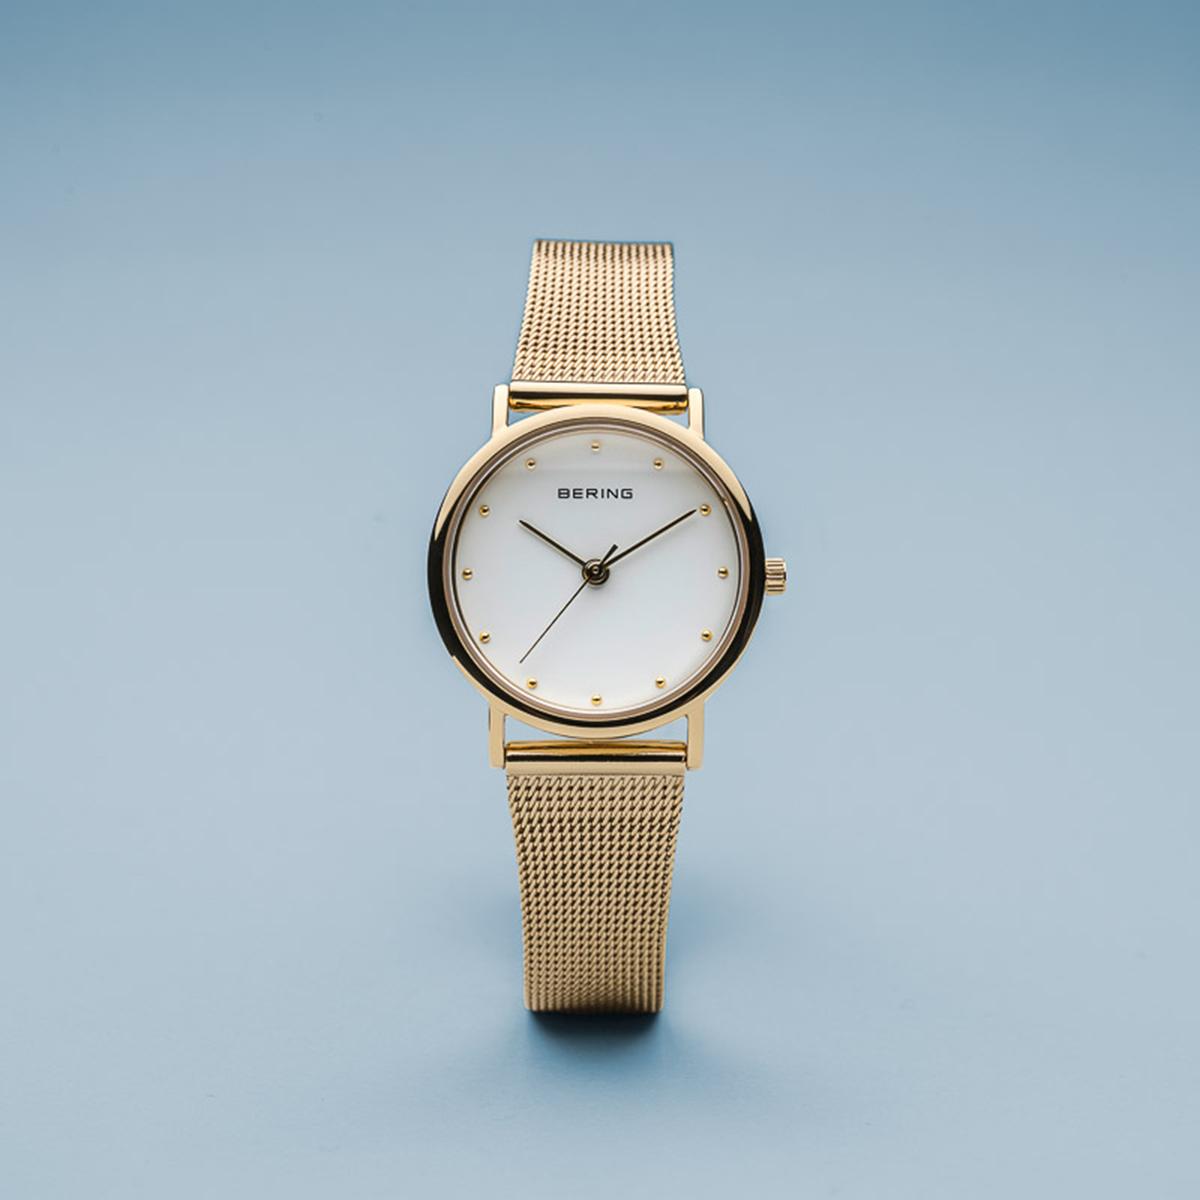 Zegarek damski Bering classic 13426-334 - duże 3